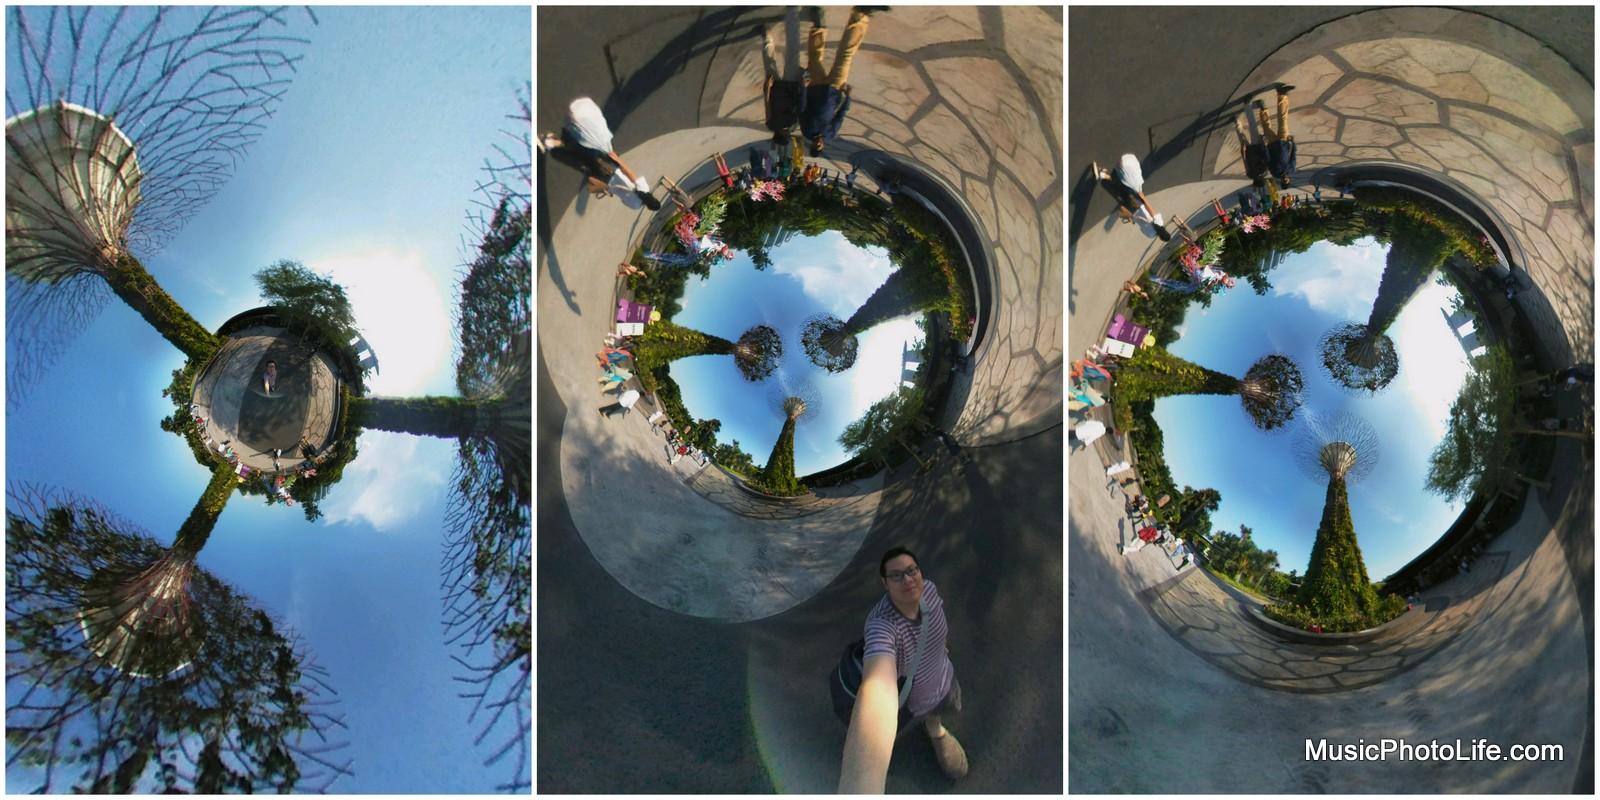 Creating many views of the same 360 photo